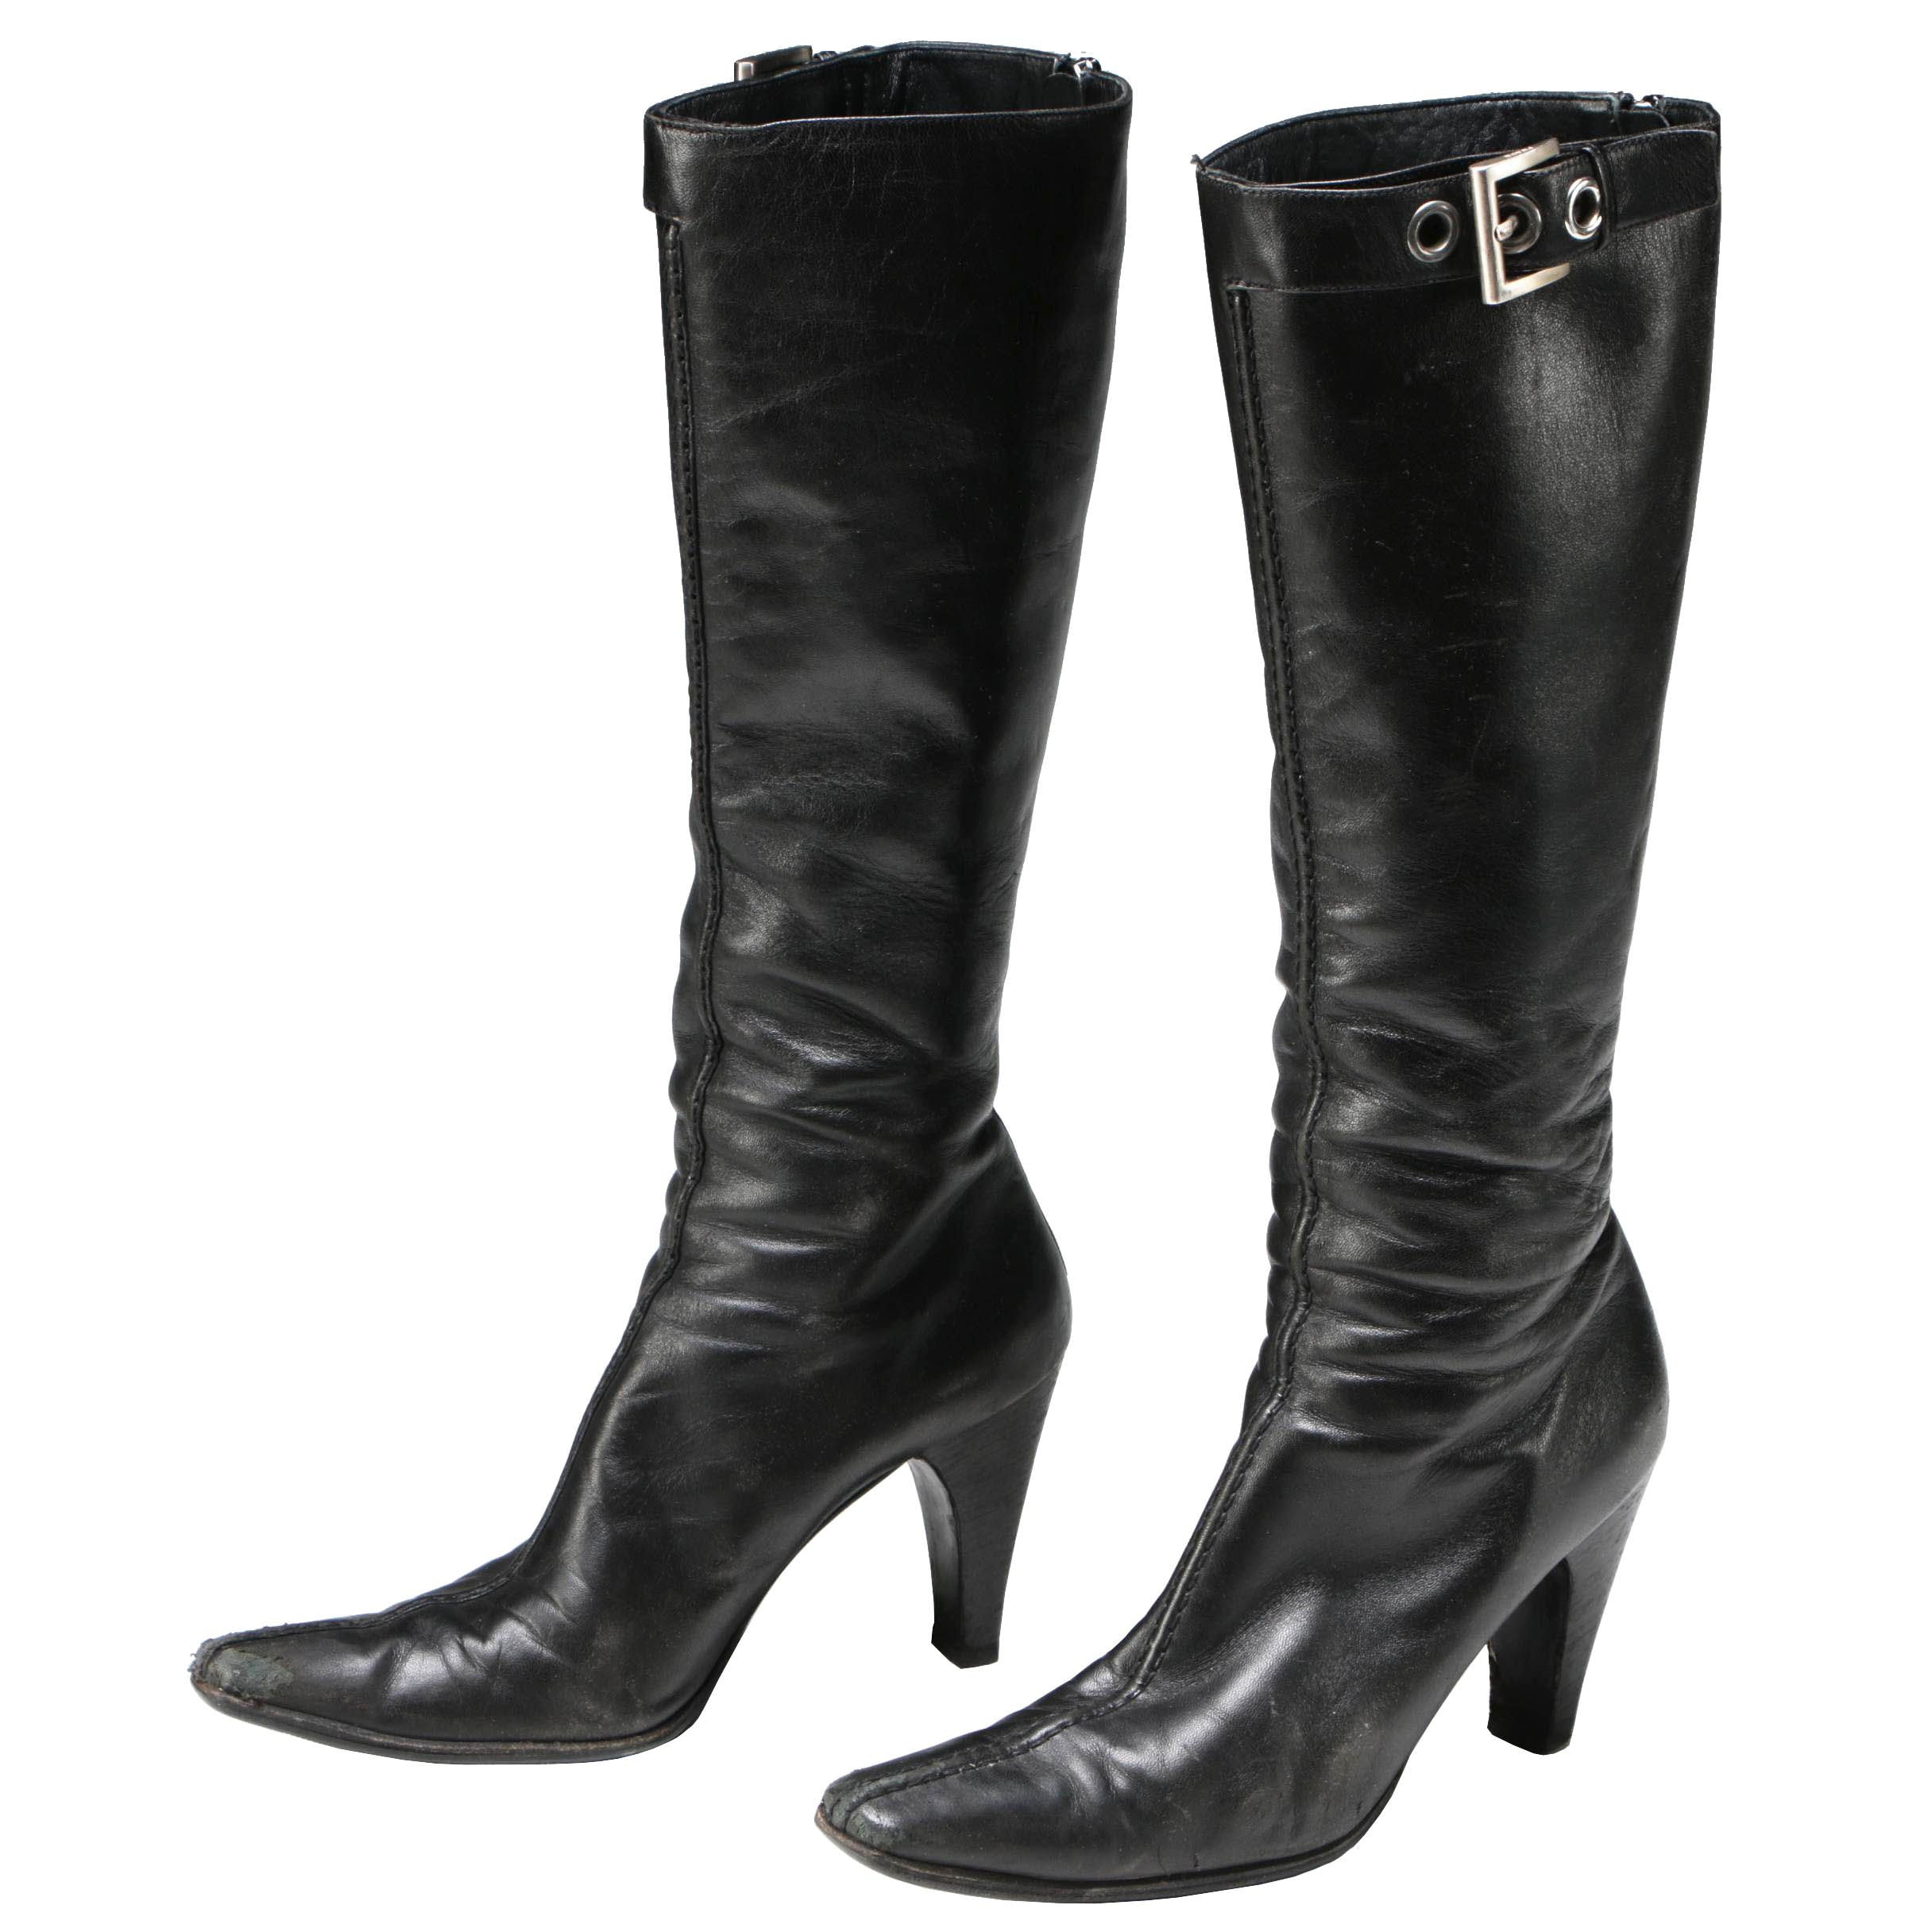 Prada Black Leather Tall Boots